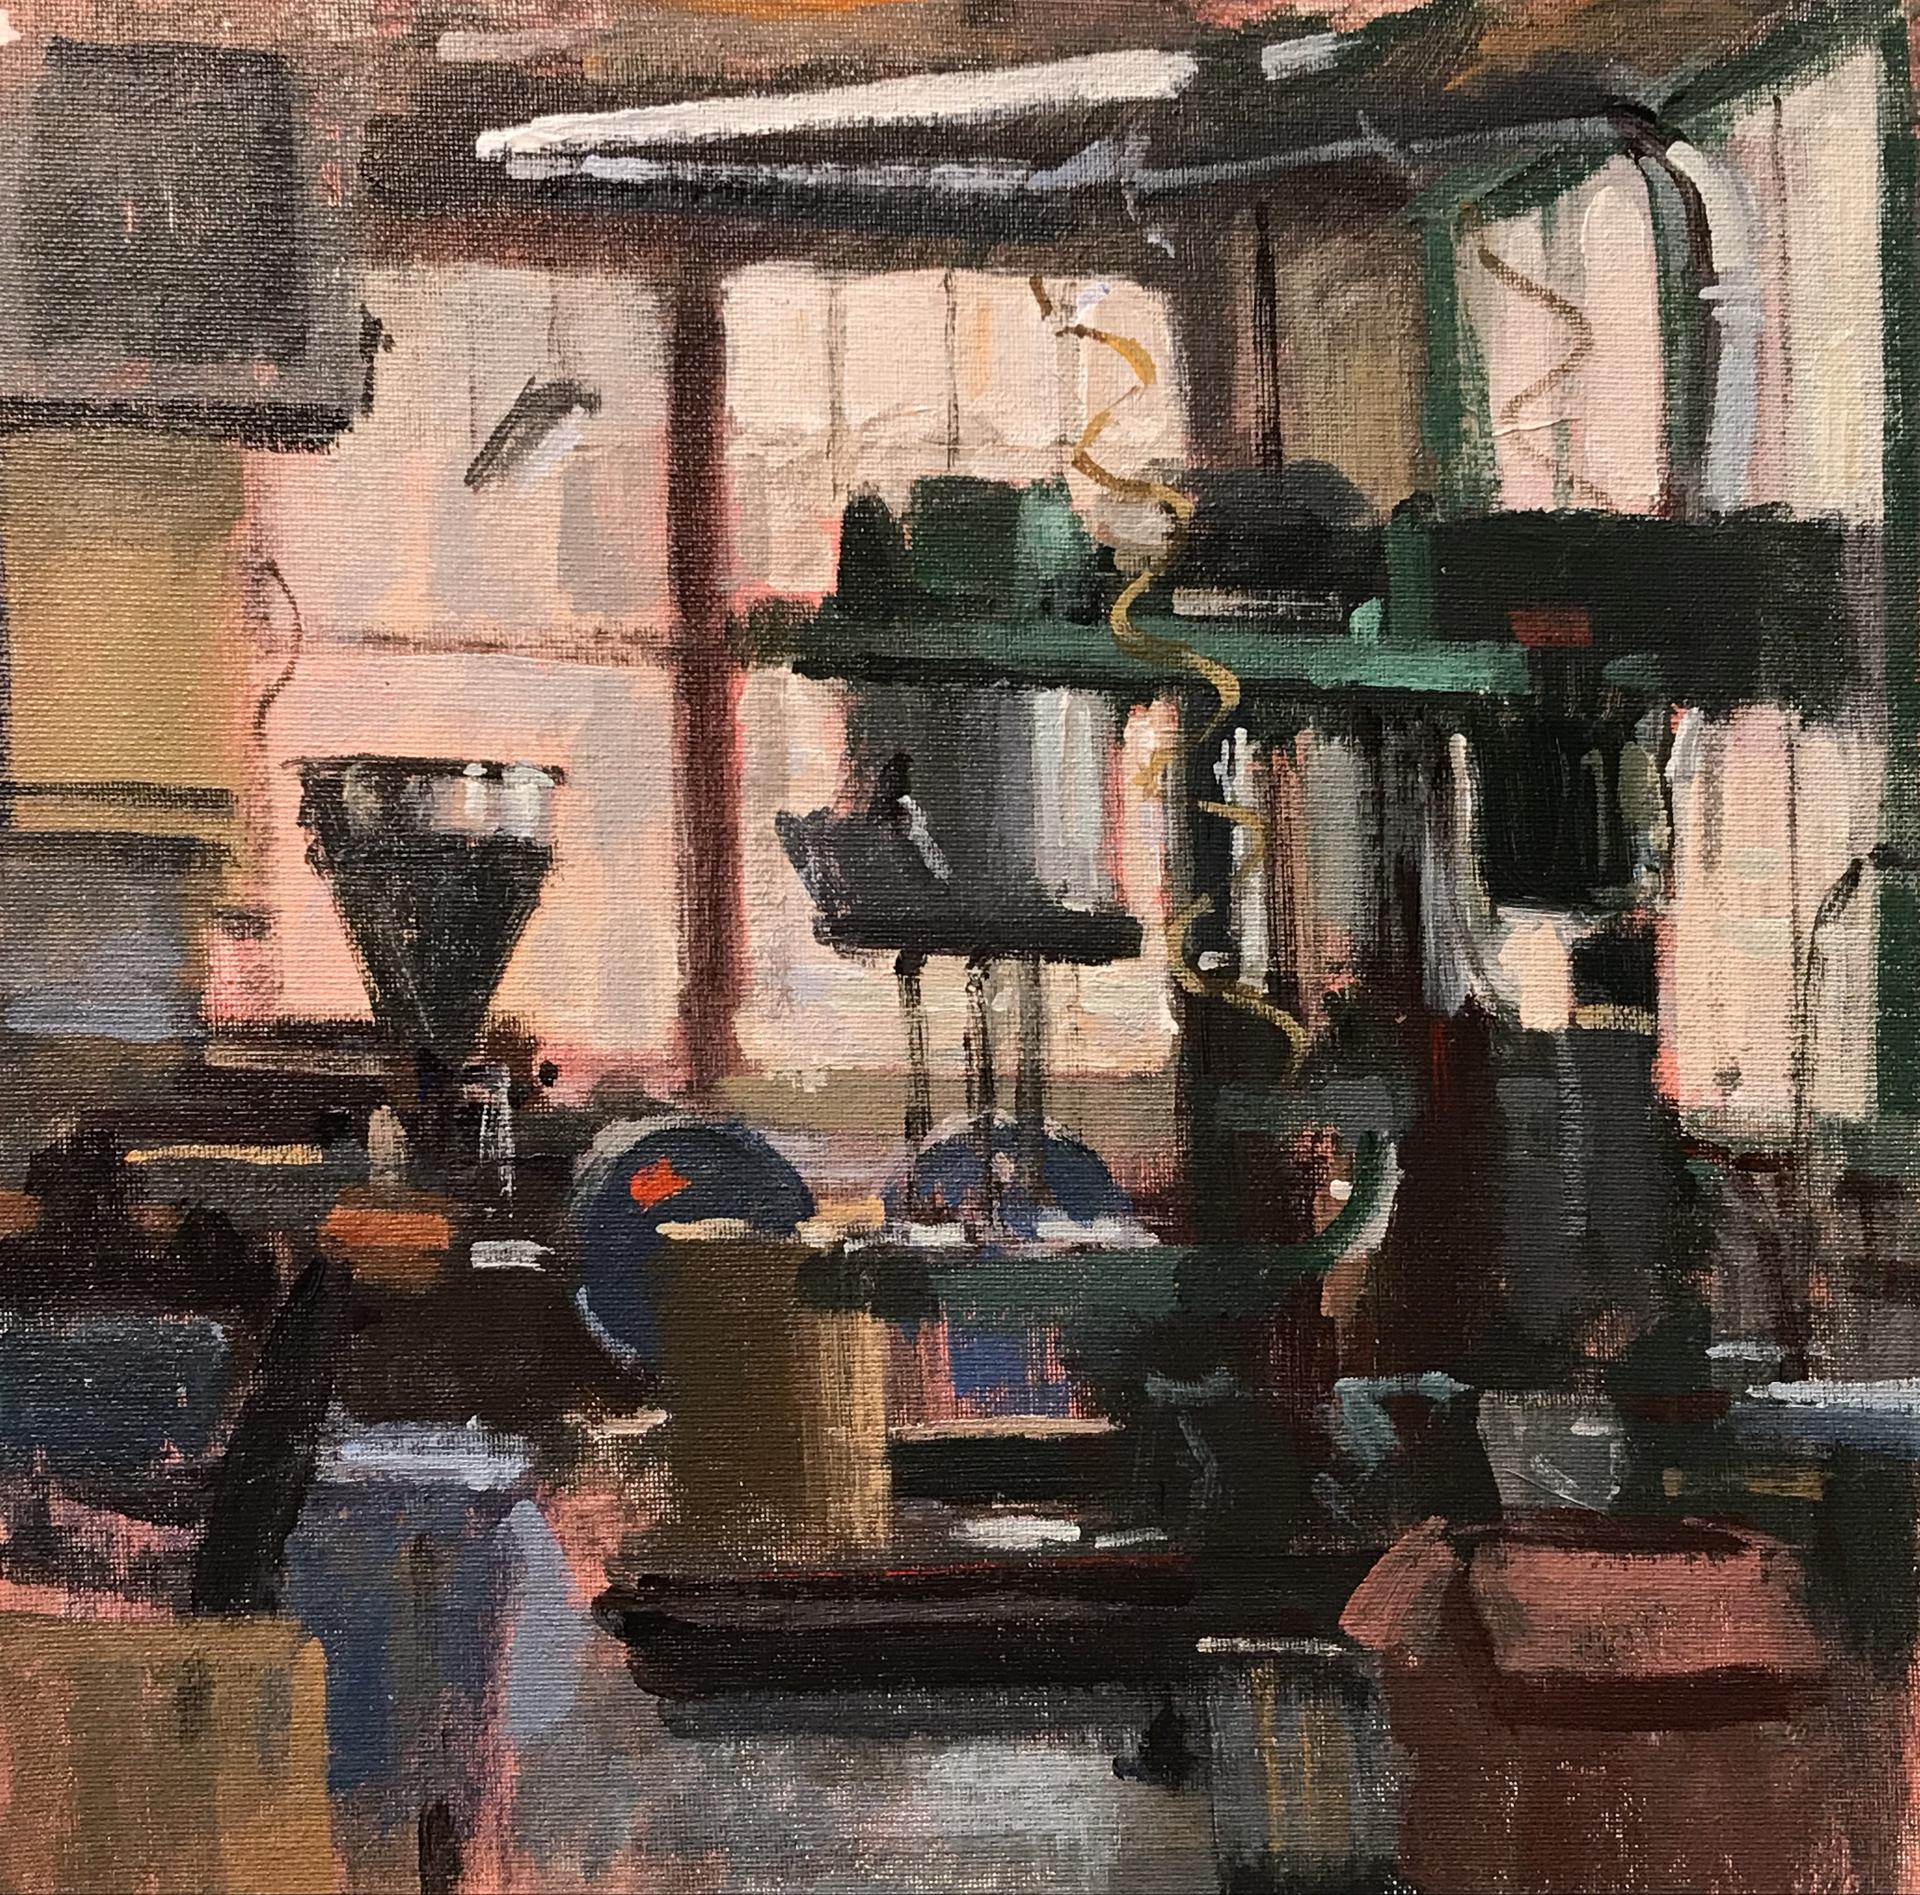 Brooklyn Paint Factory  by Joe Gyurcsak